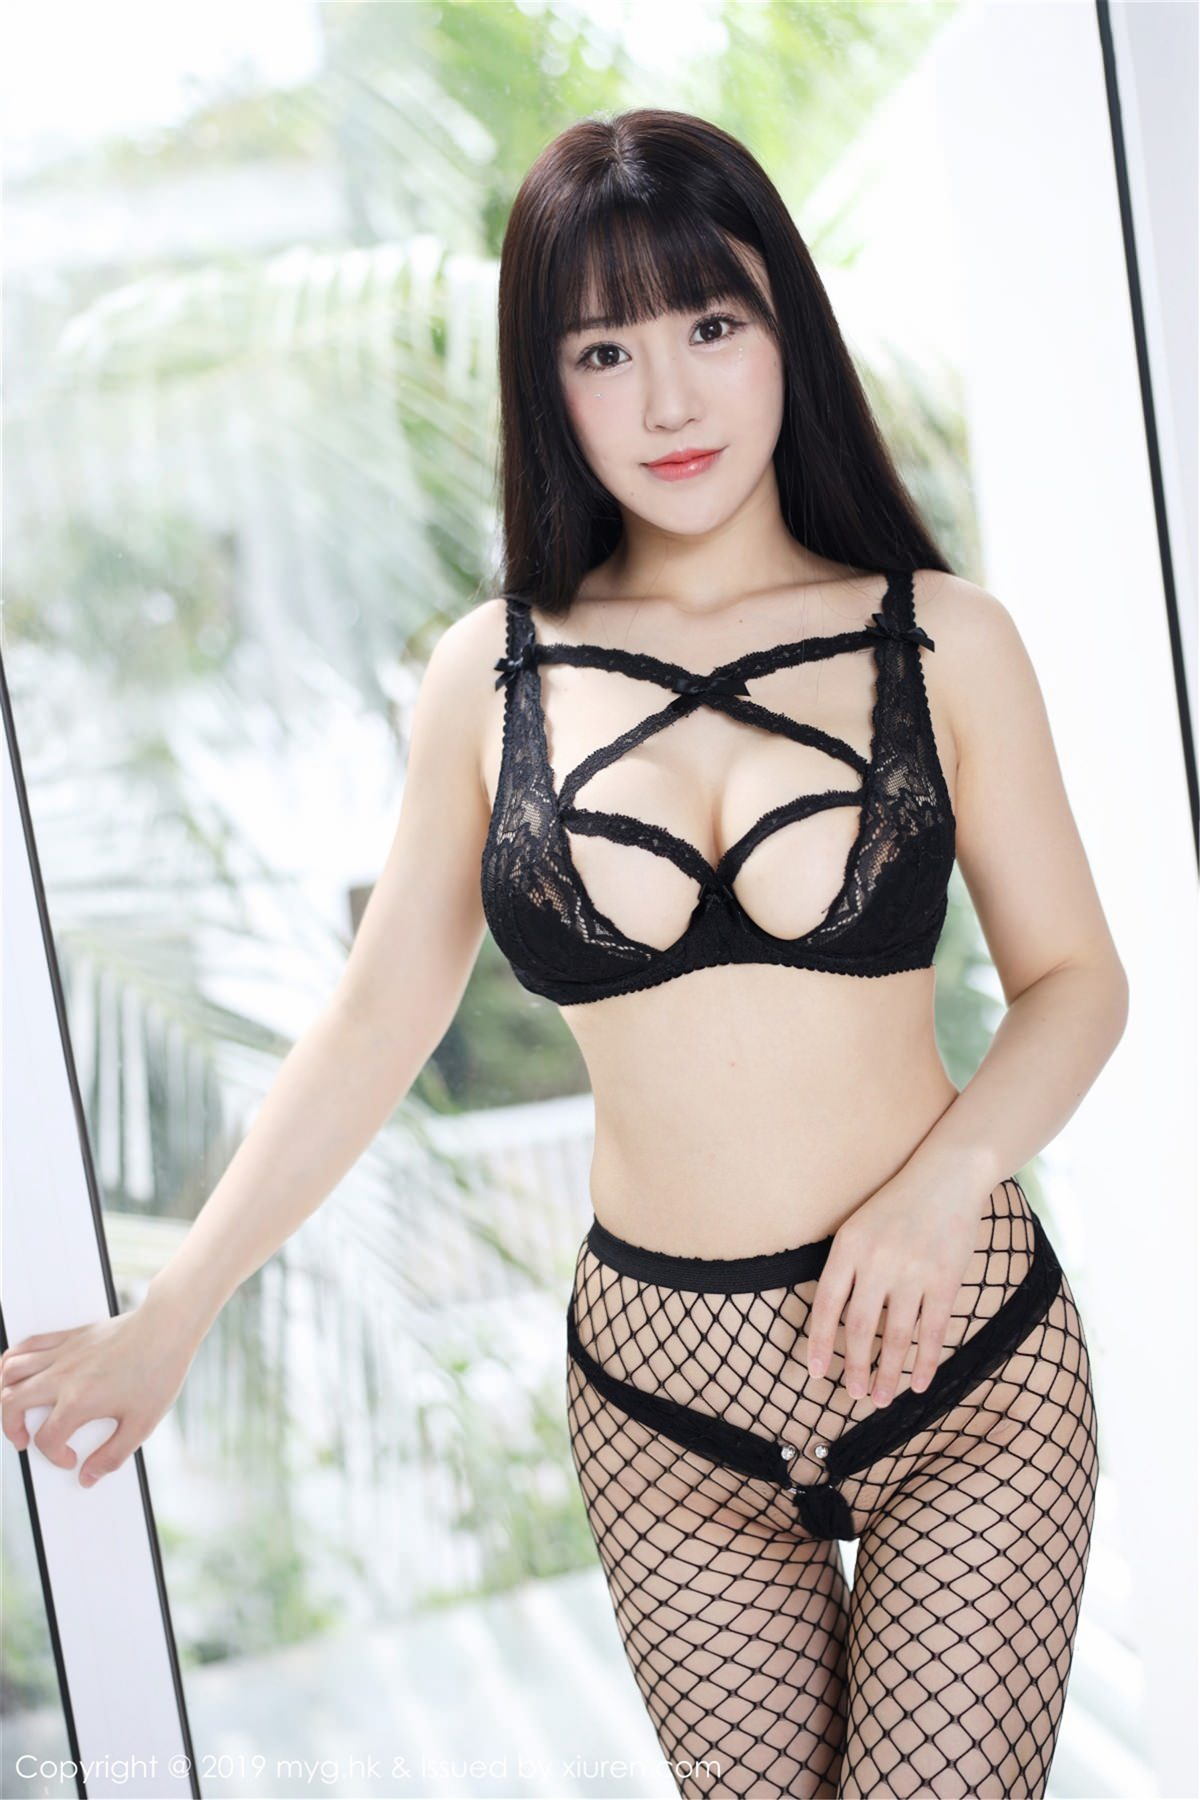 MyGirl Vol.357 11P, mygirl, Zhu Ke Er